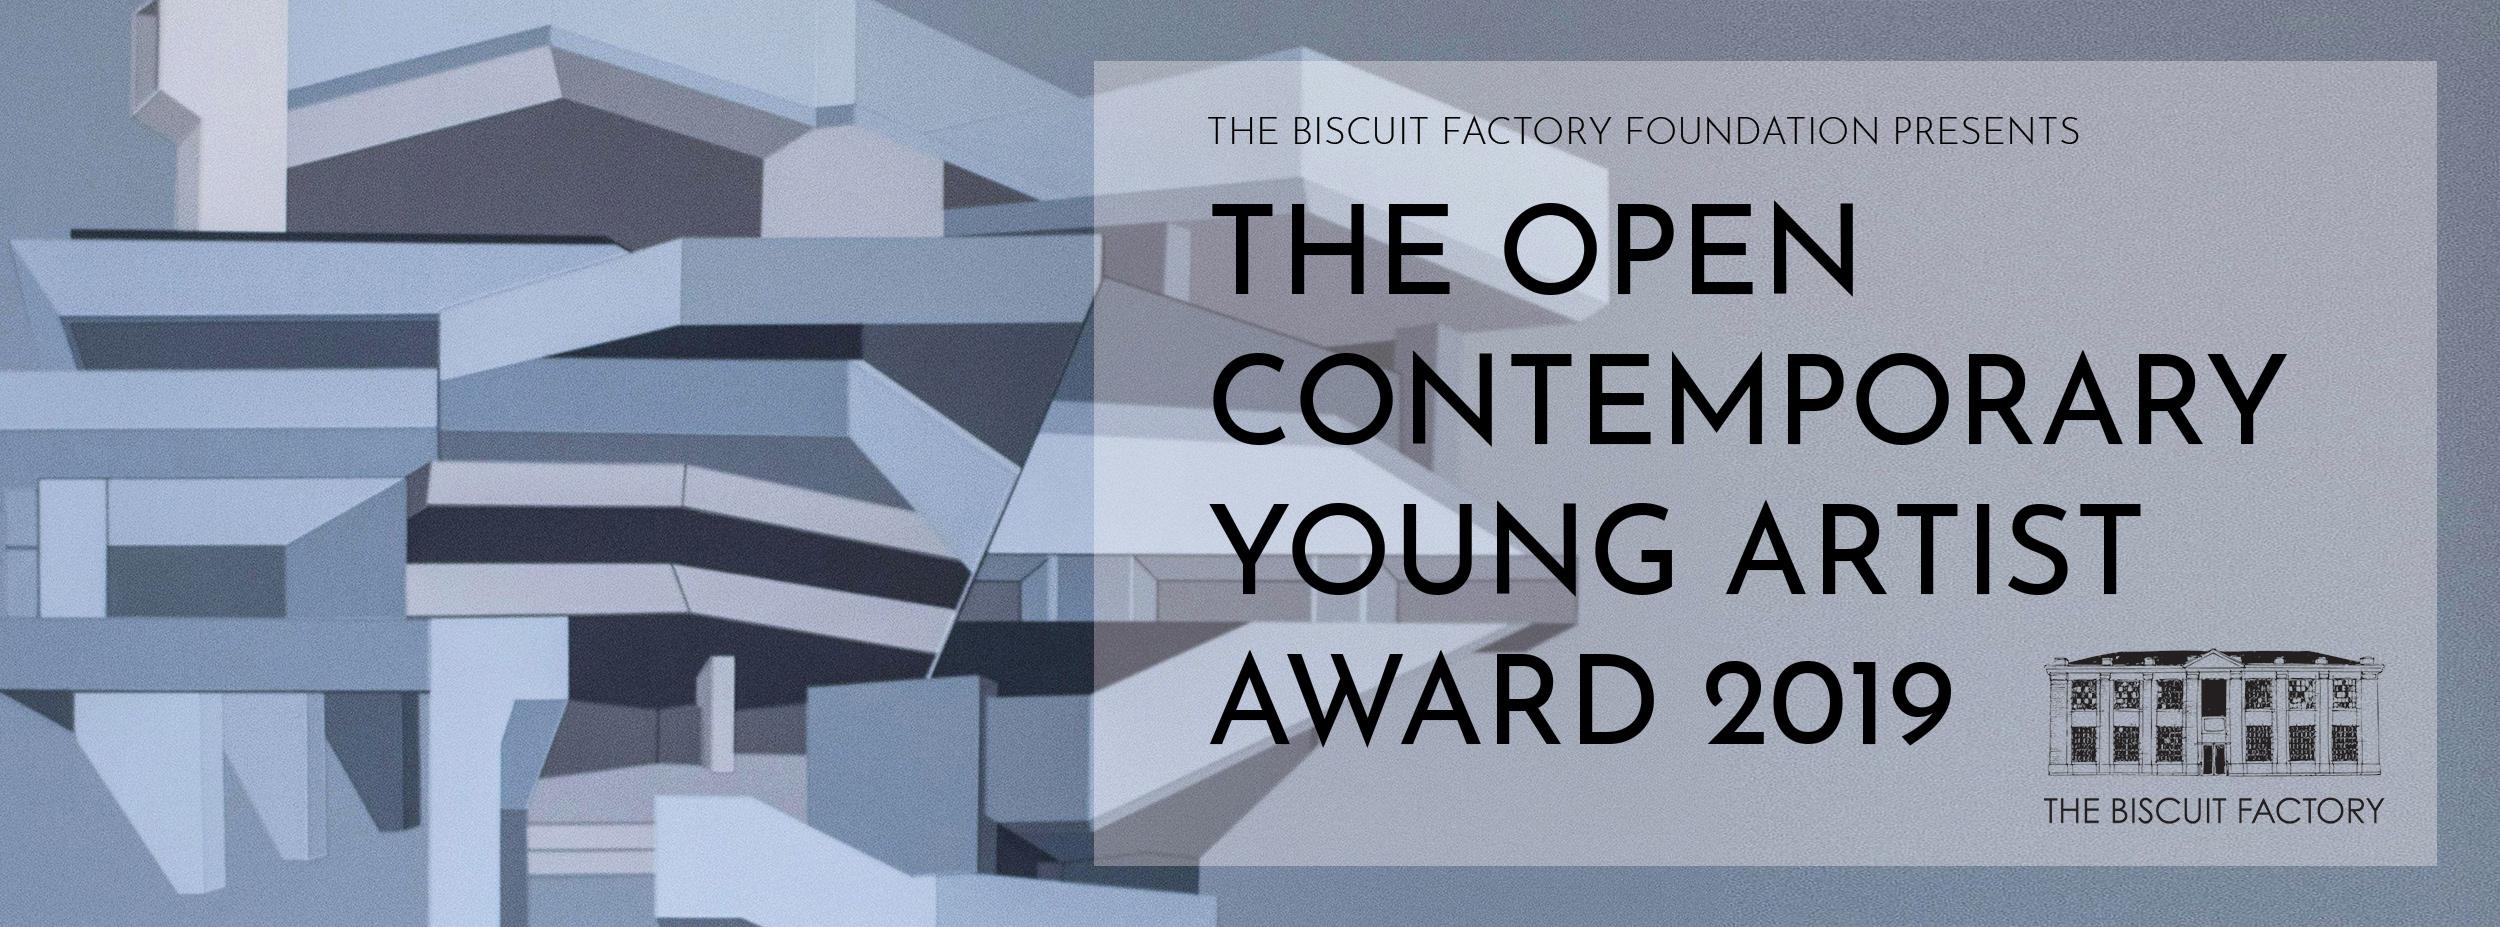 Open Contemporary Young Artist Award Image #0